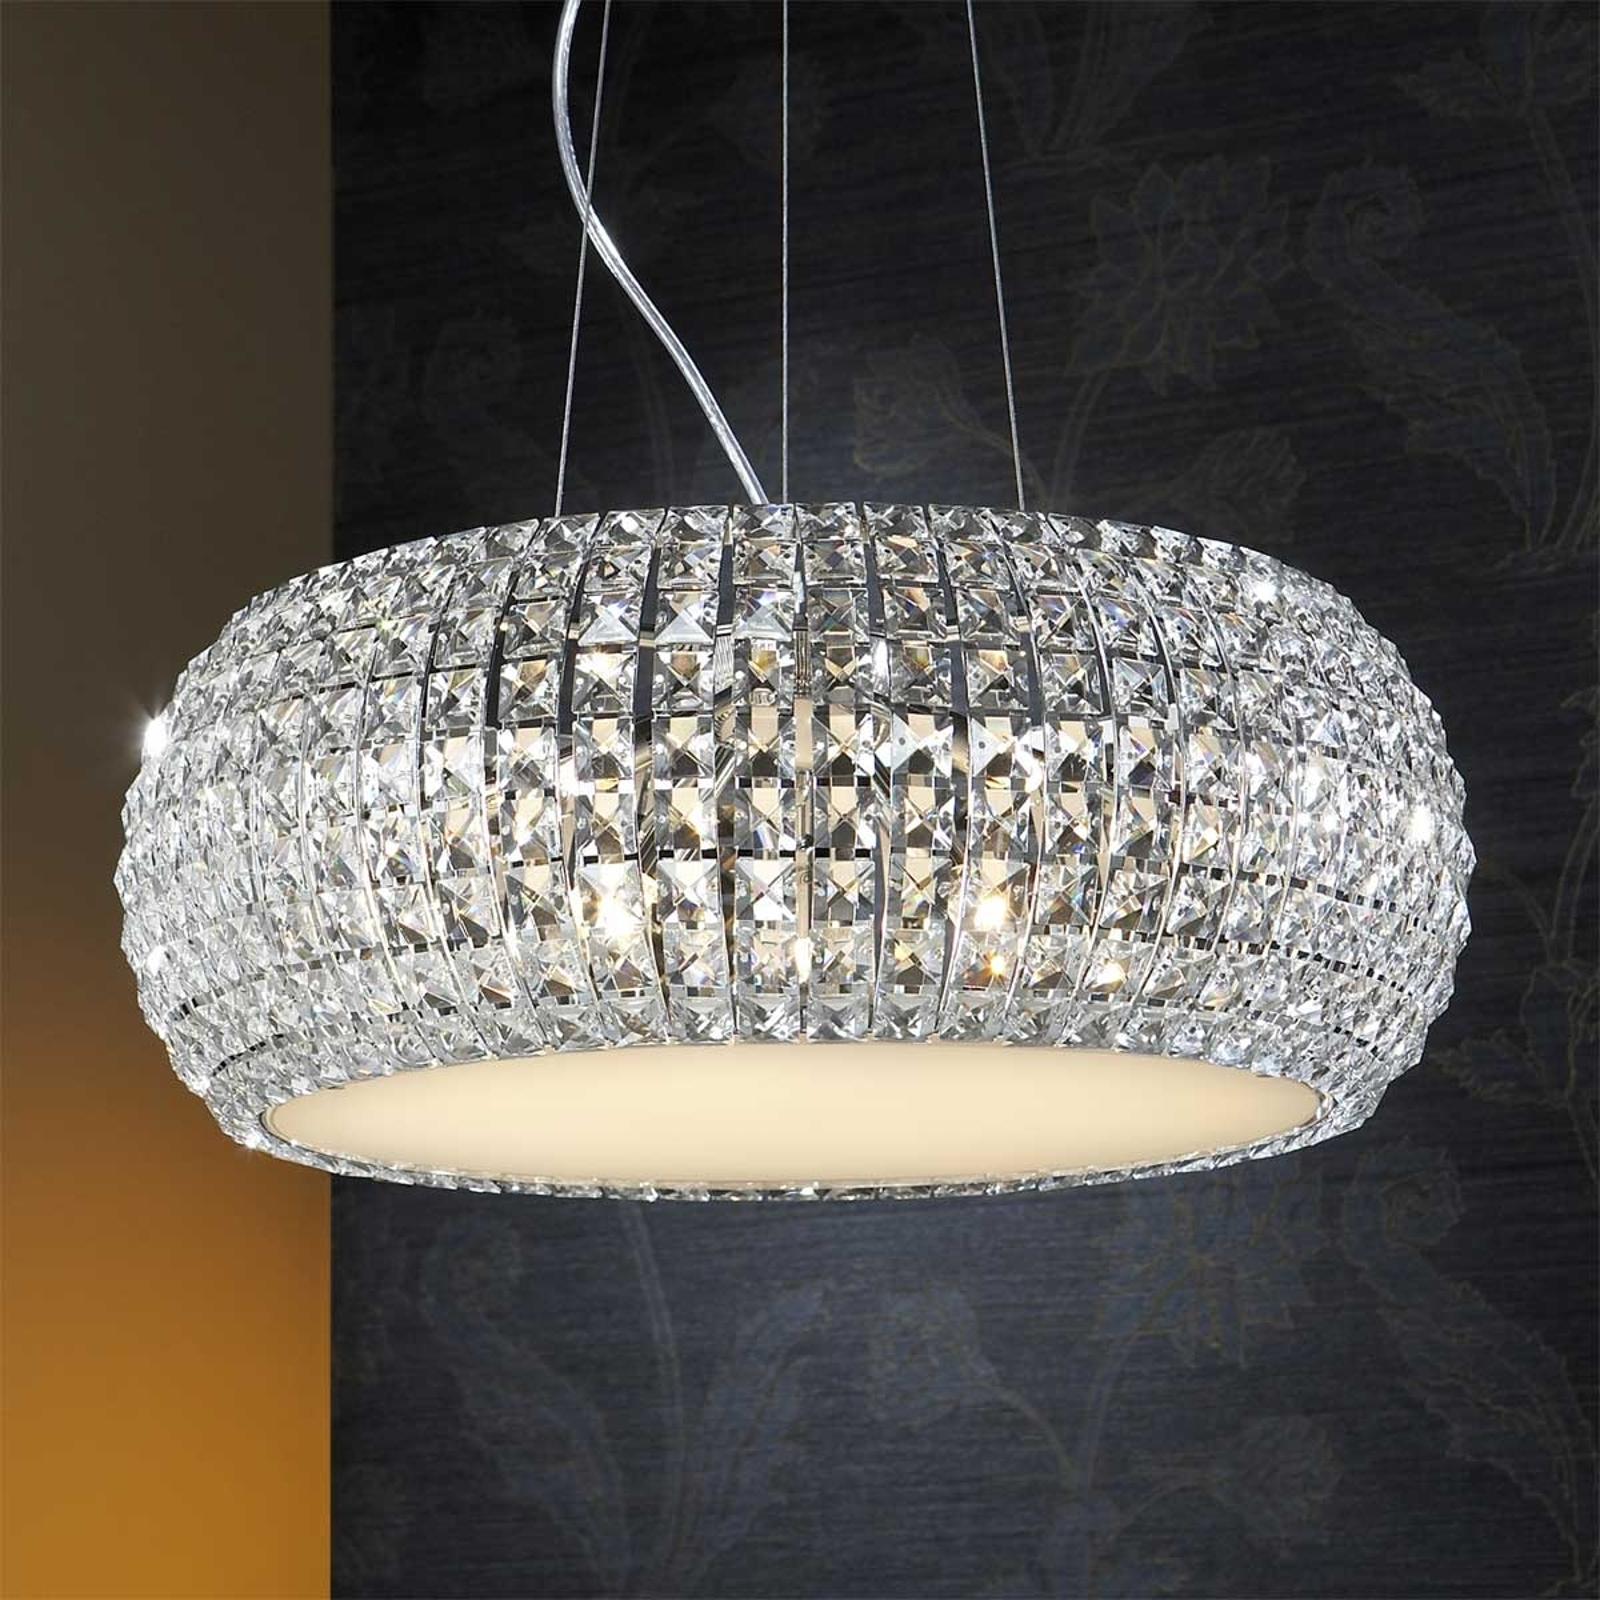 Schitterende hanglamp DIAMOND, rond